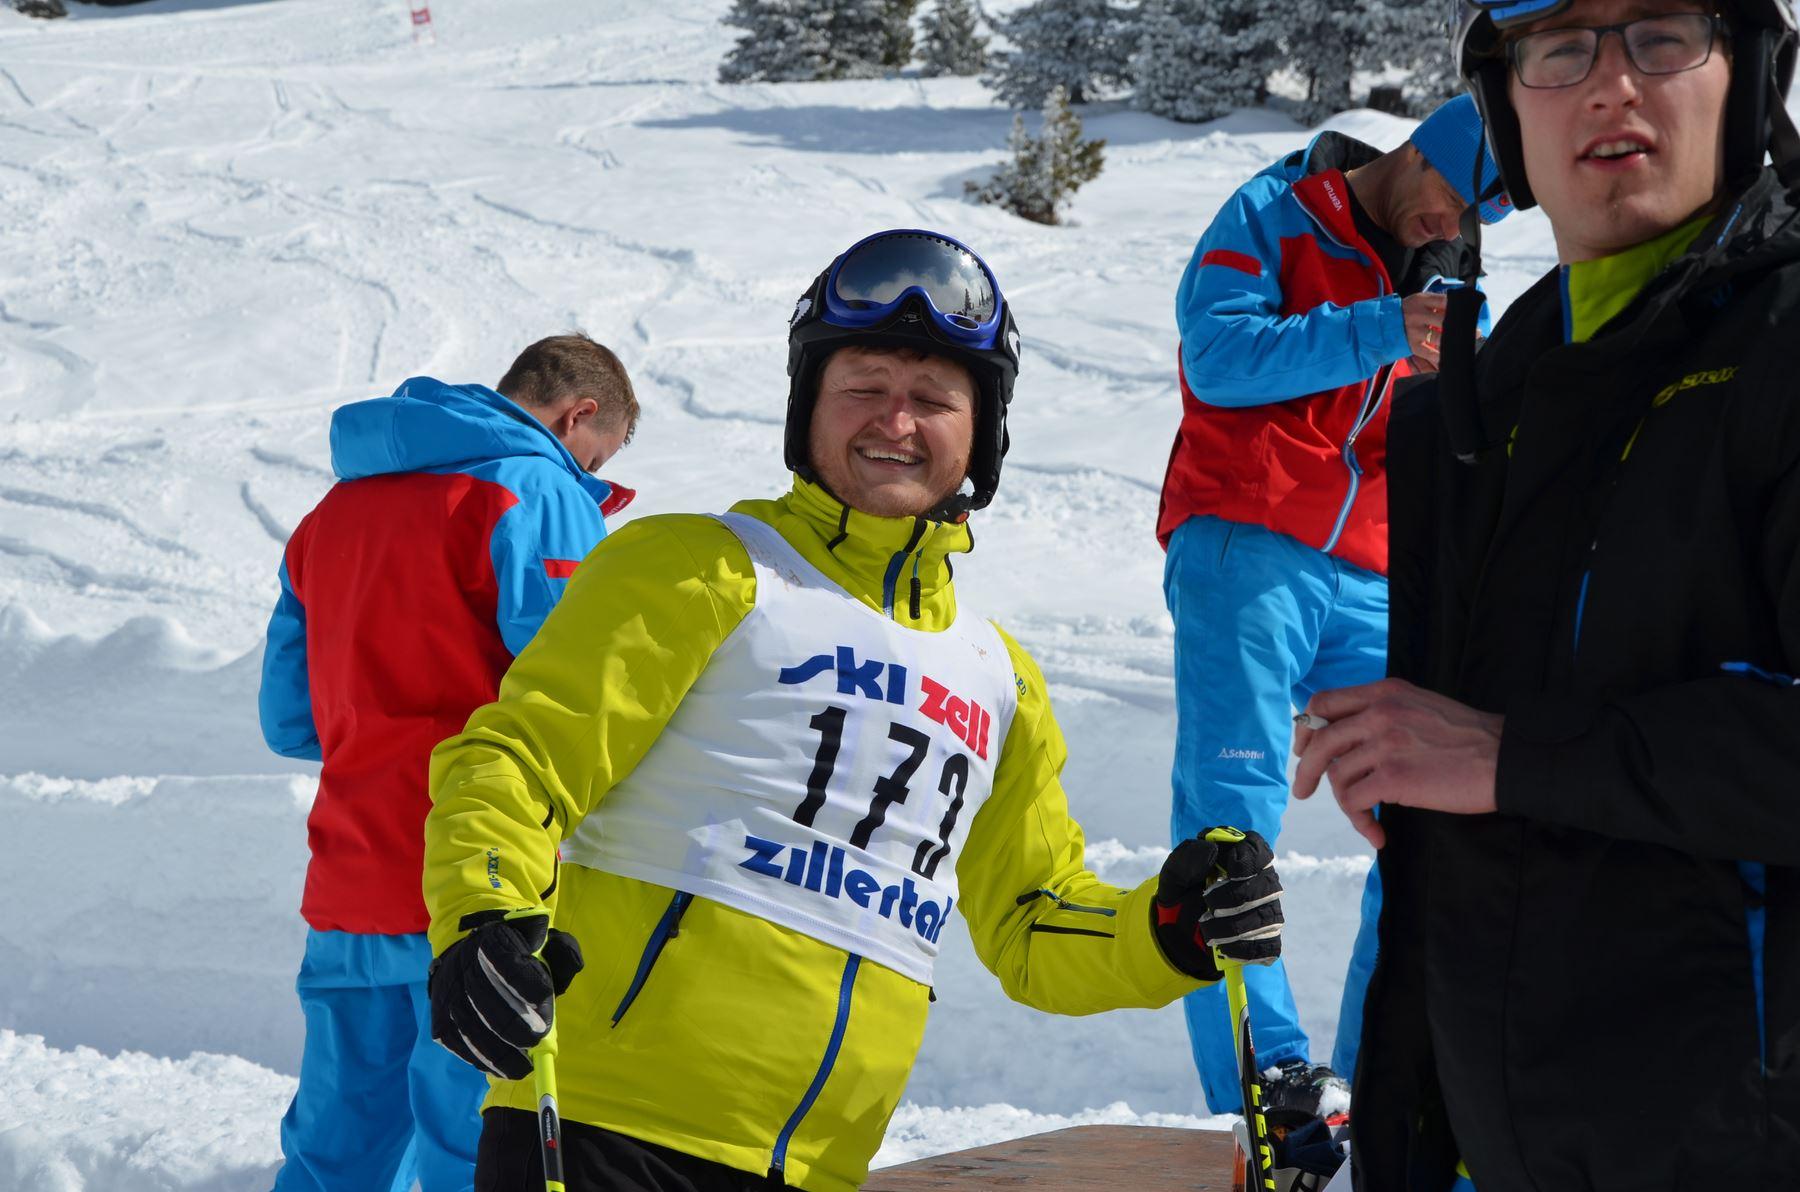 2015-03-22 BV Zillertal Skirennen 288.JPG